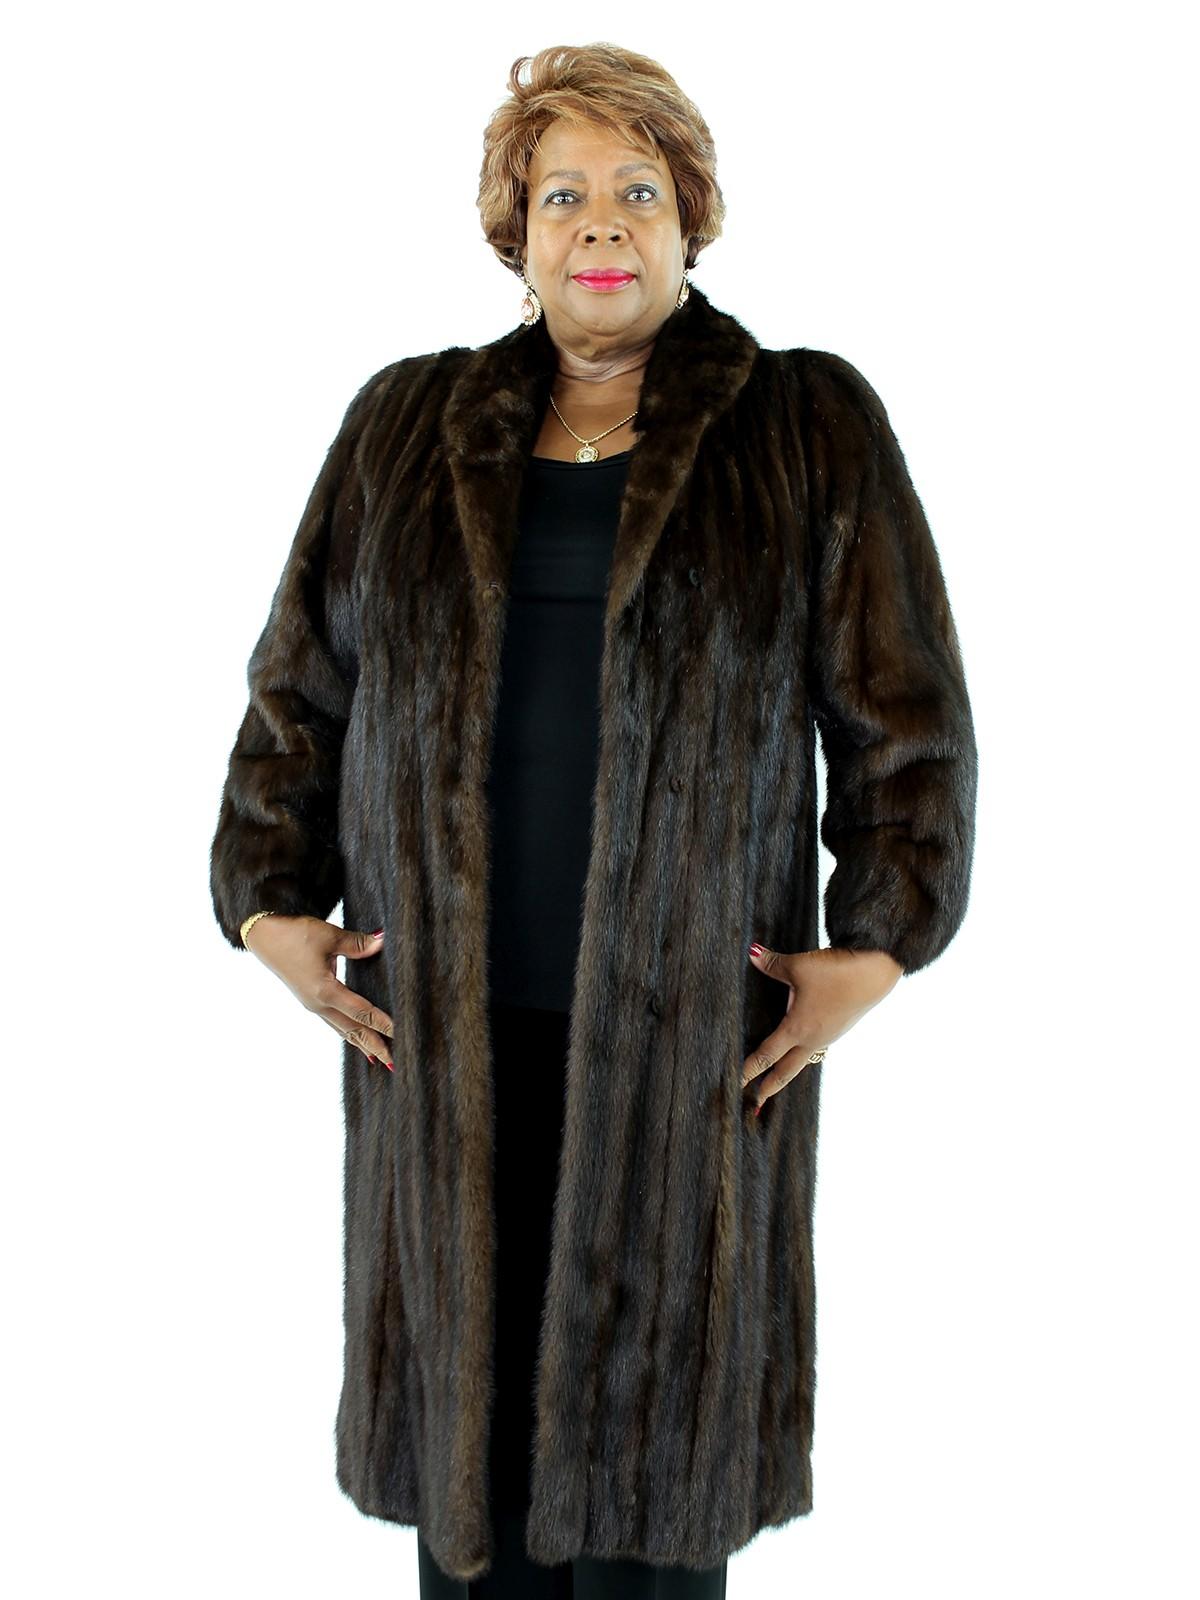 671fef454 Dark Mahogany Female Mink Fur Coat - Women's Large| Estate Furs